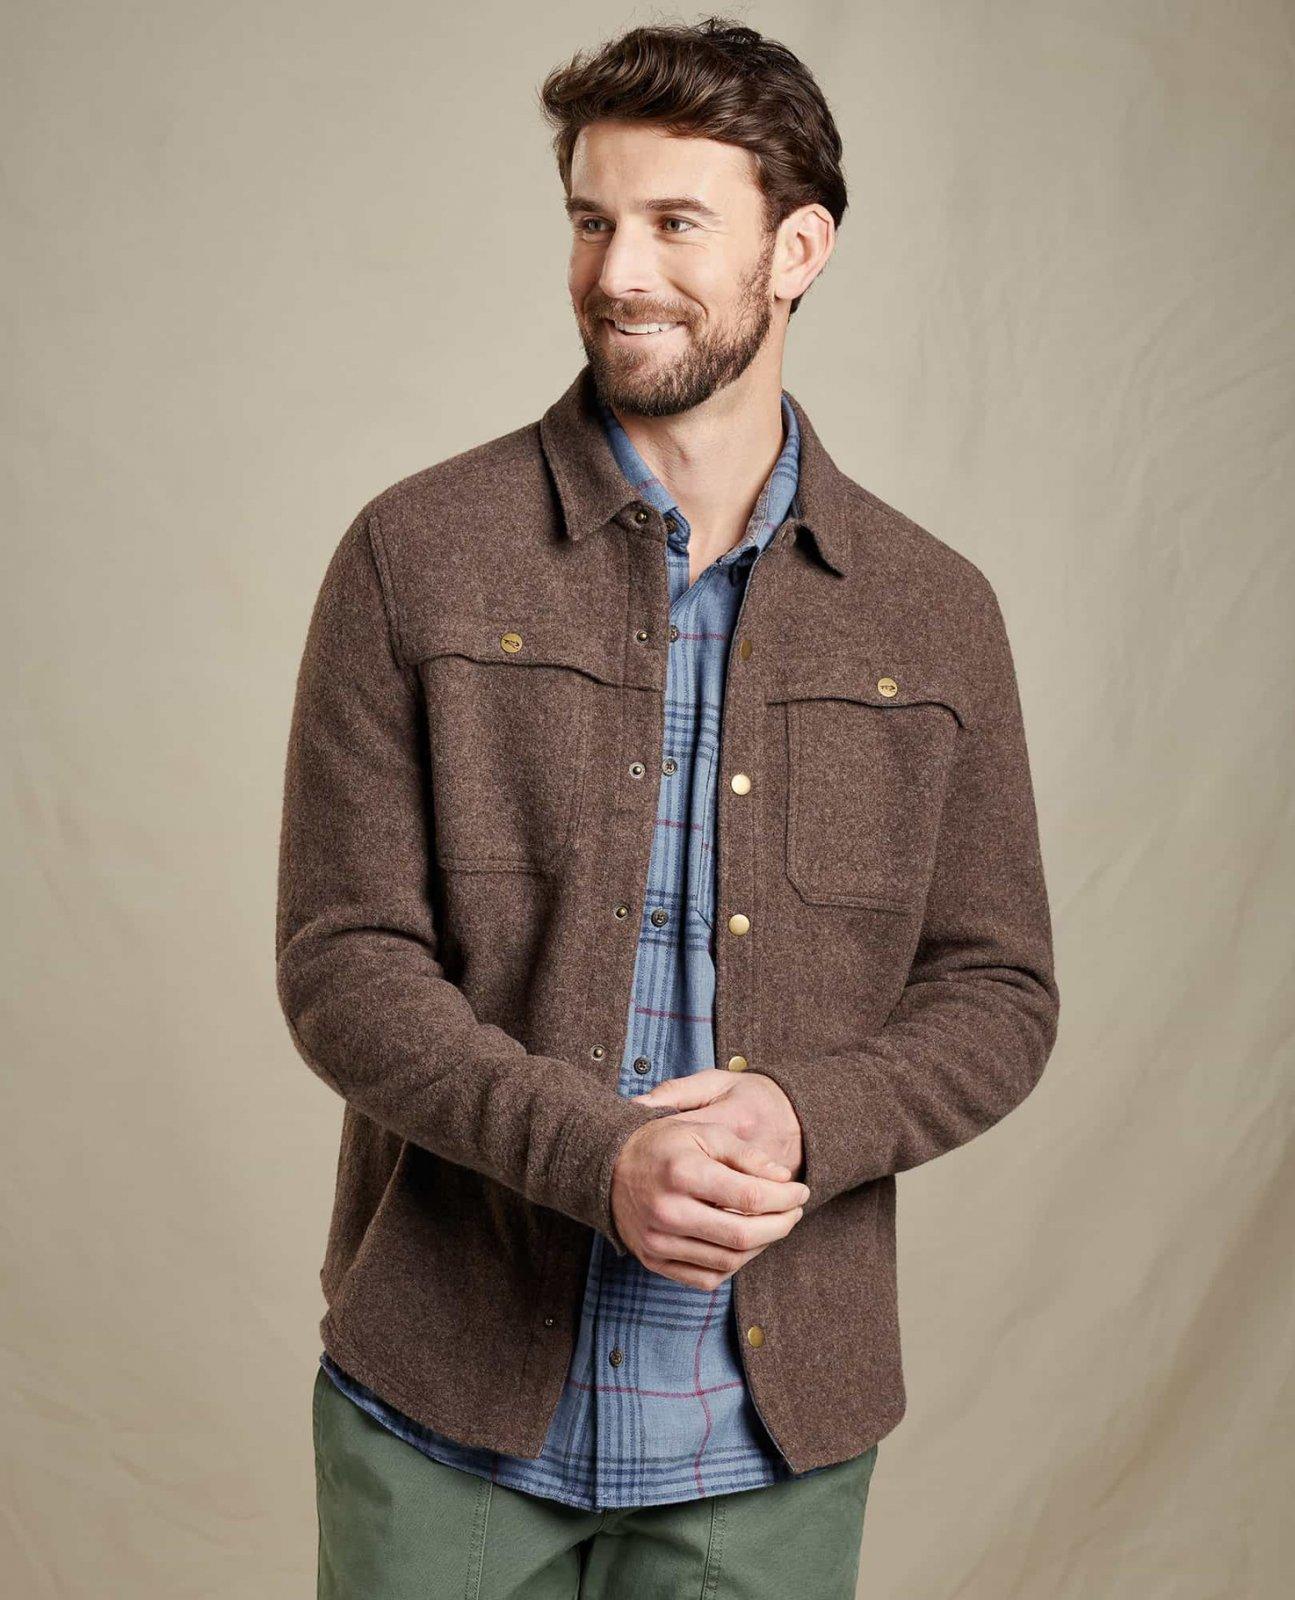 Toad&Co. Kennicott shirt jacket